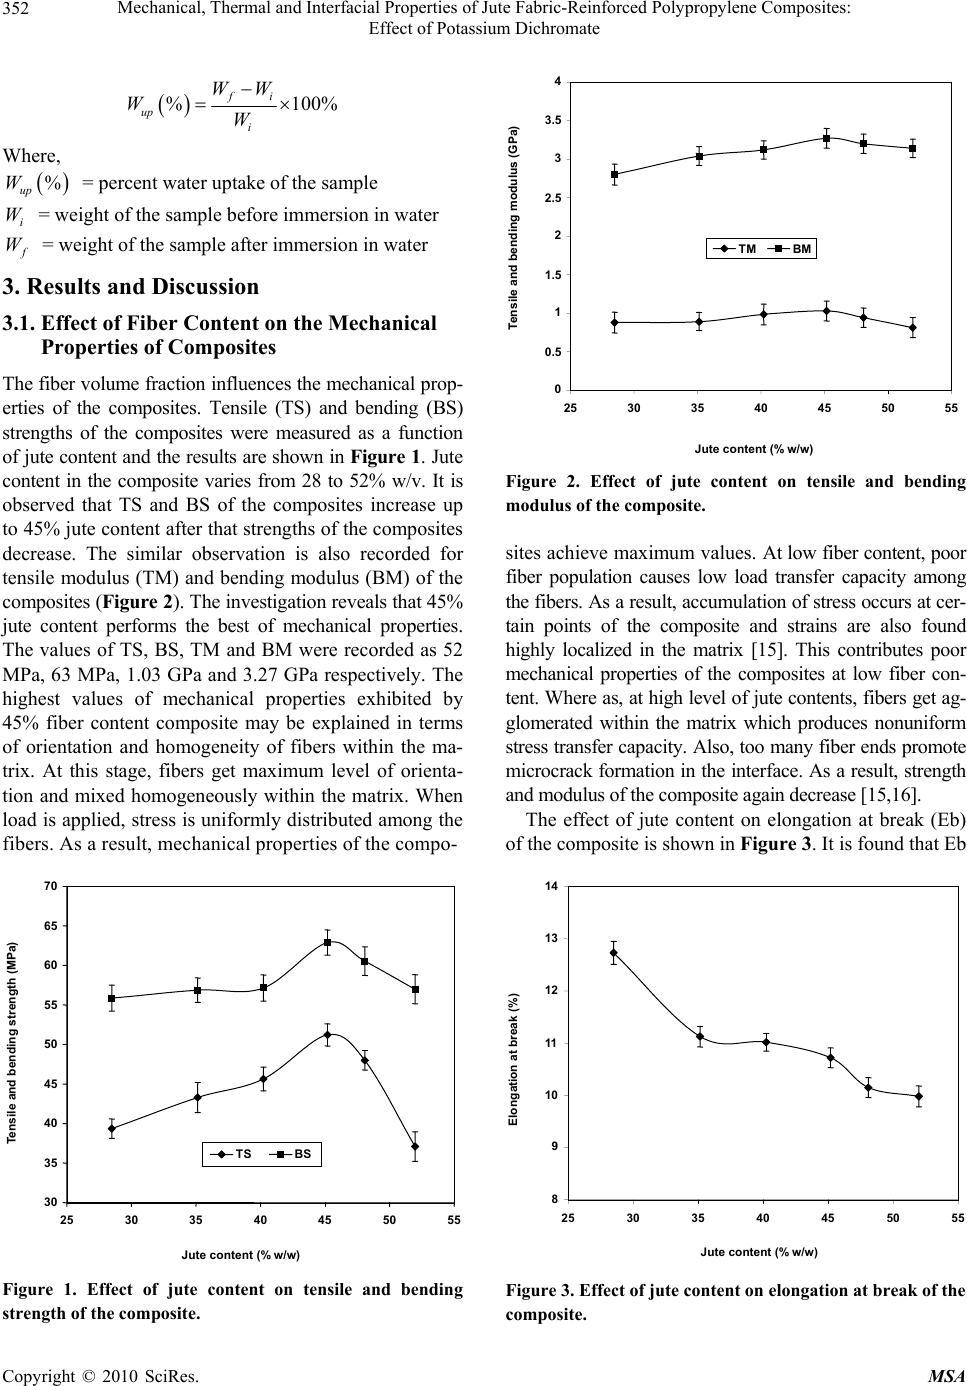 Mechanical, Thermal and Interfacial Properties of Jute